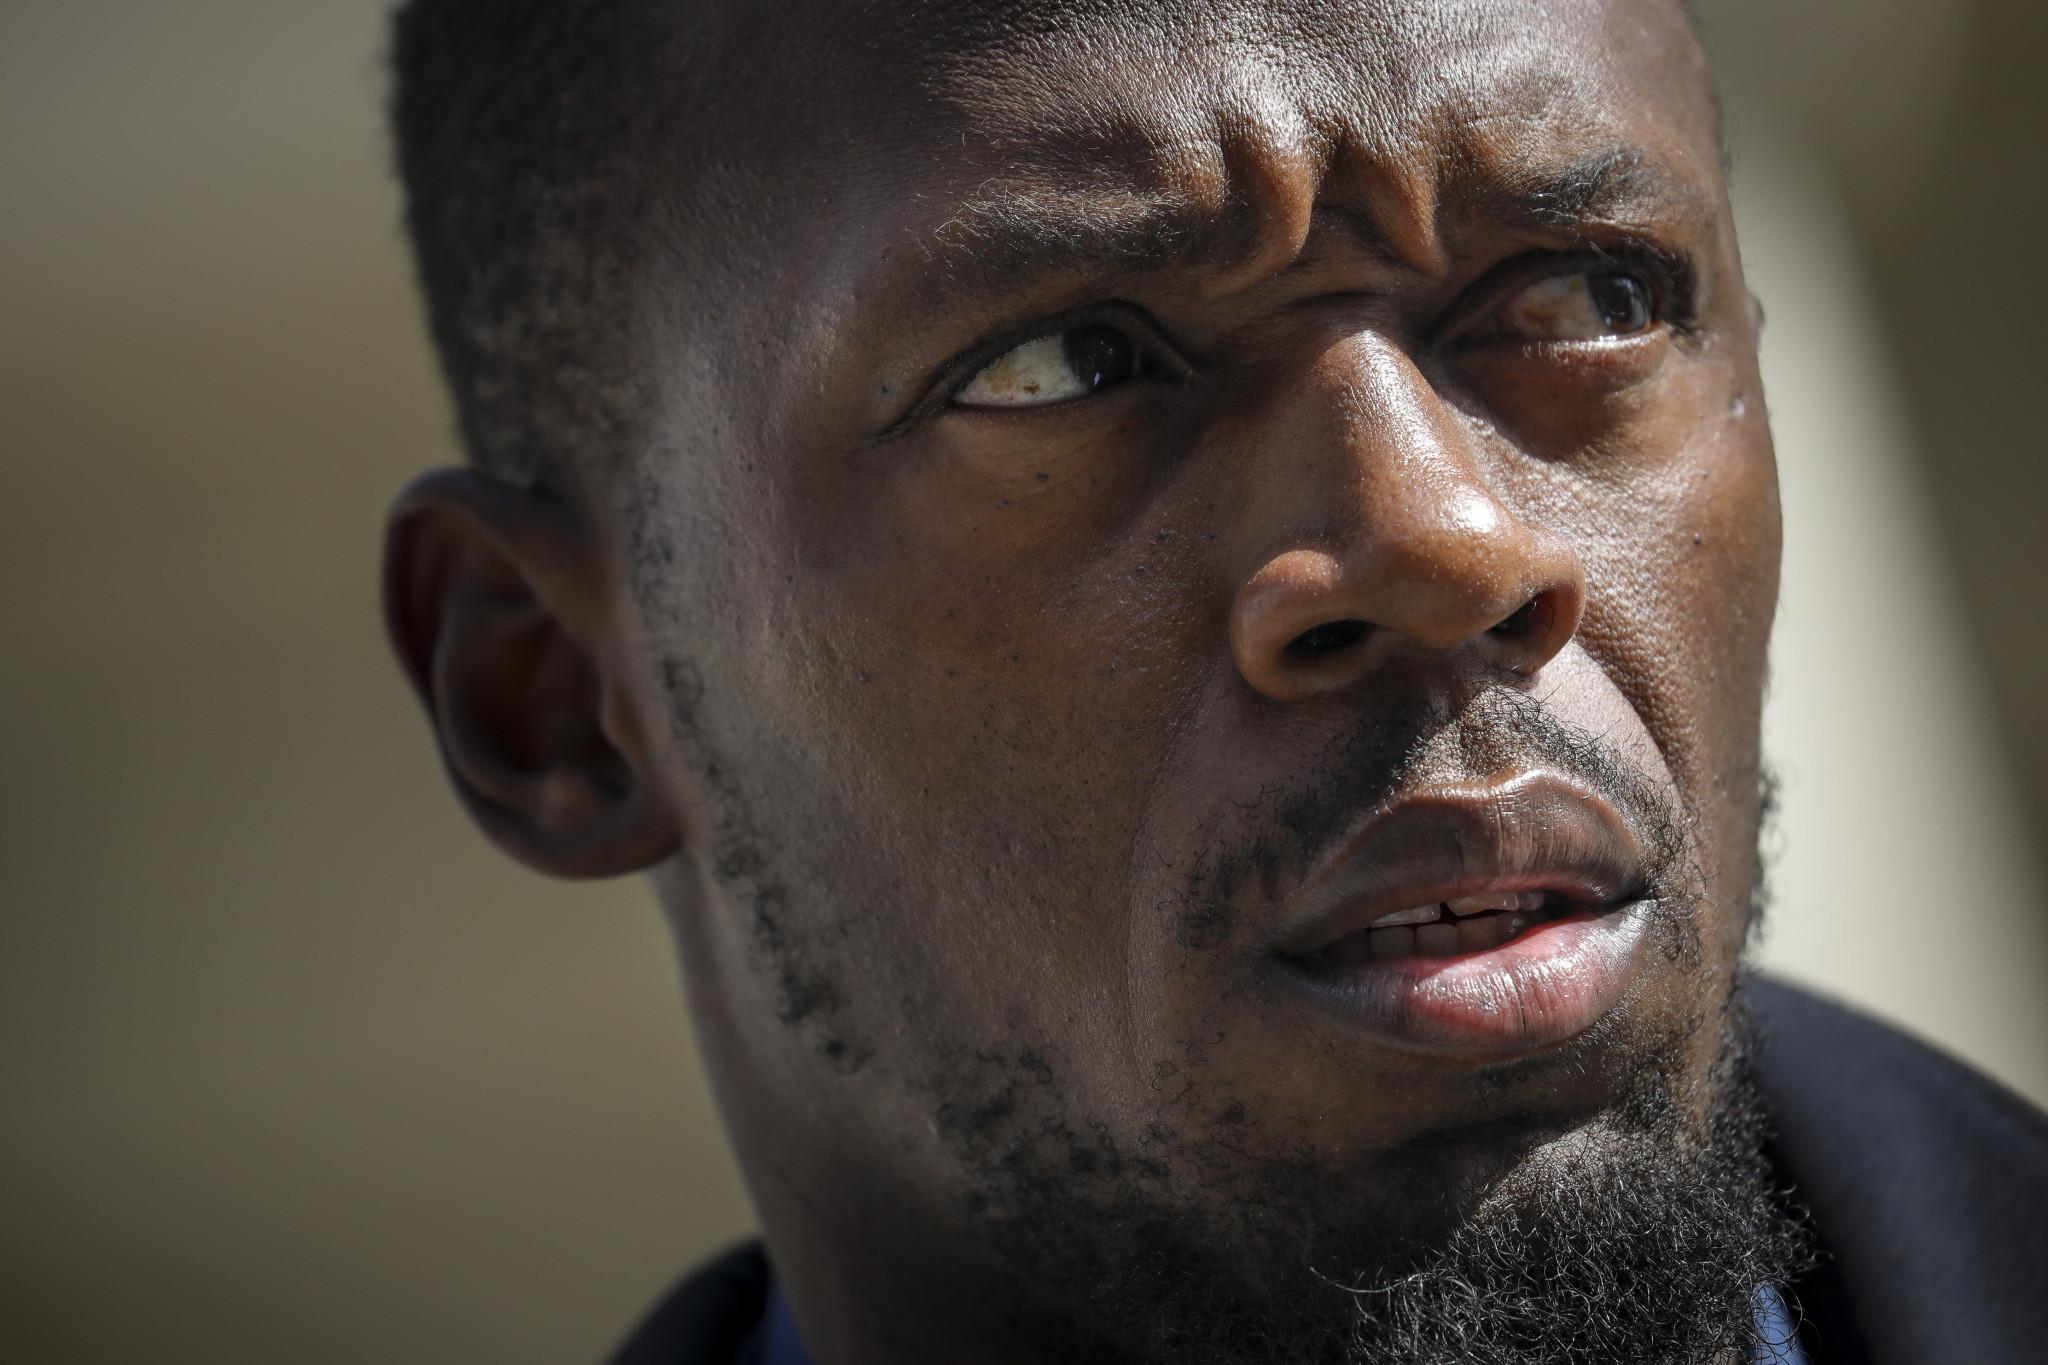 Bolt coronavirus positive confirmed as police investigate birthday party